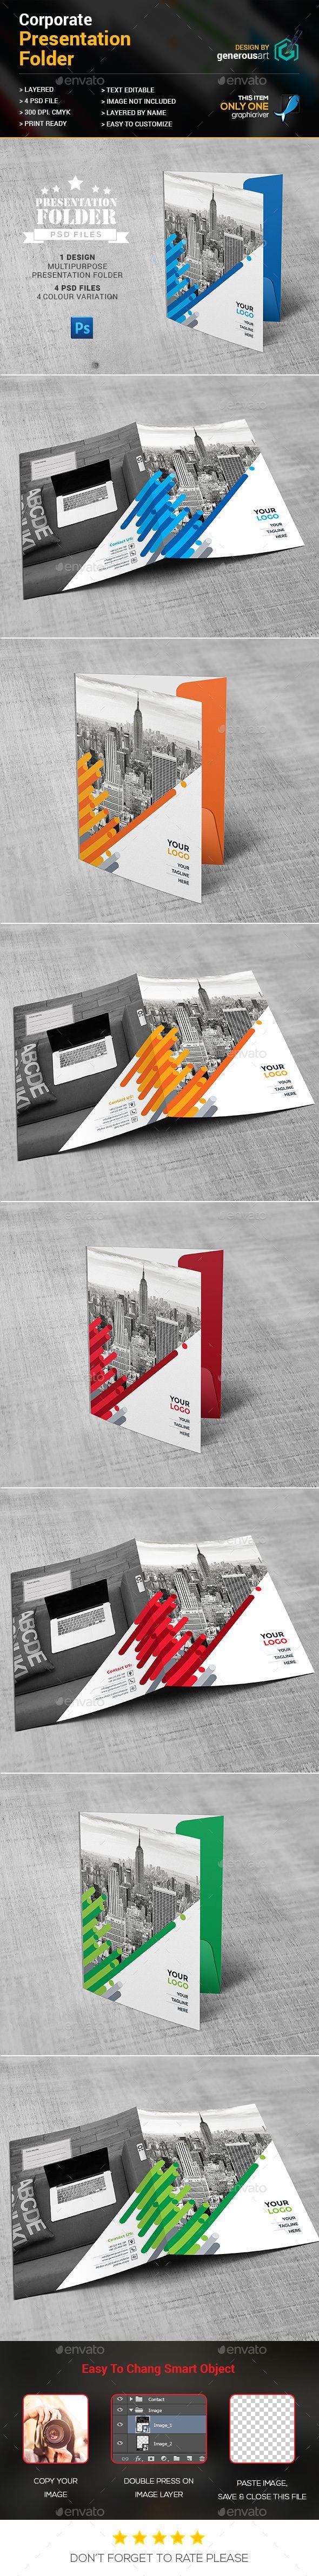 Business Presentation Folder Design Template - Stationery Print Template PSD. Download here: http://graphicriver.net/item/business-presentation-folder/16691229?ref=yinkira